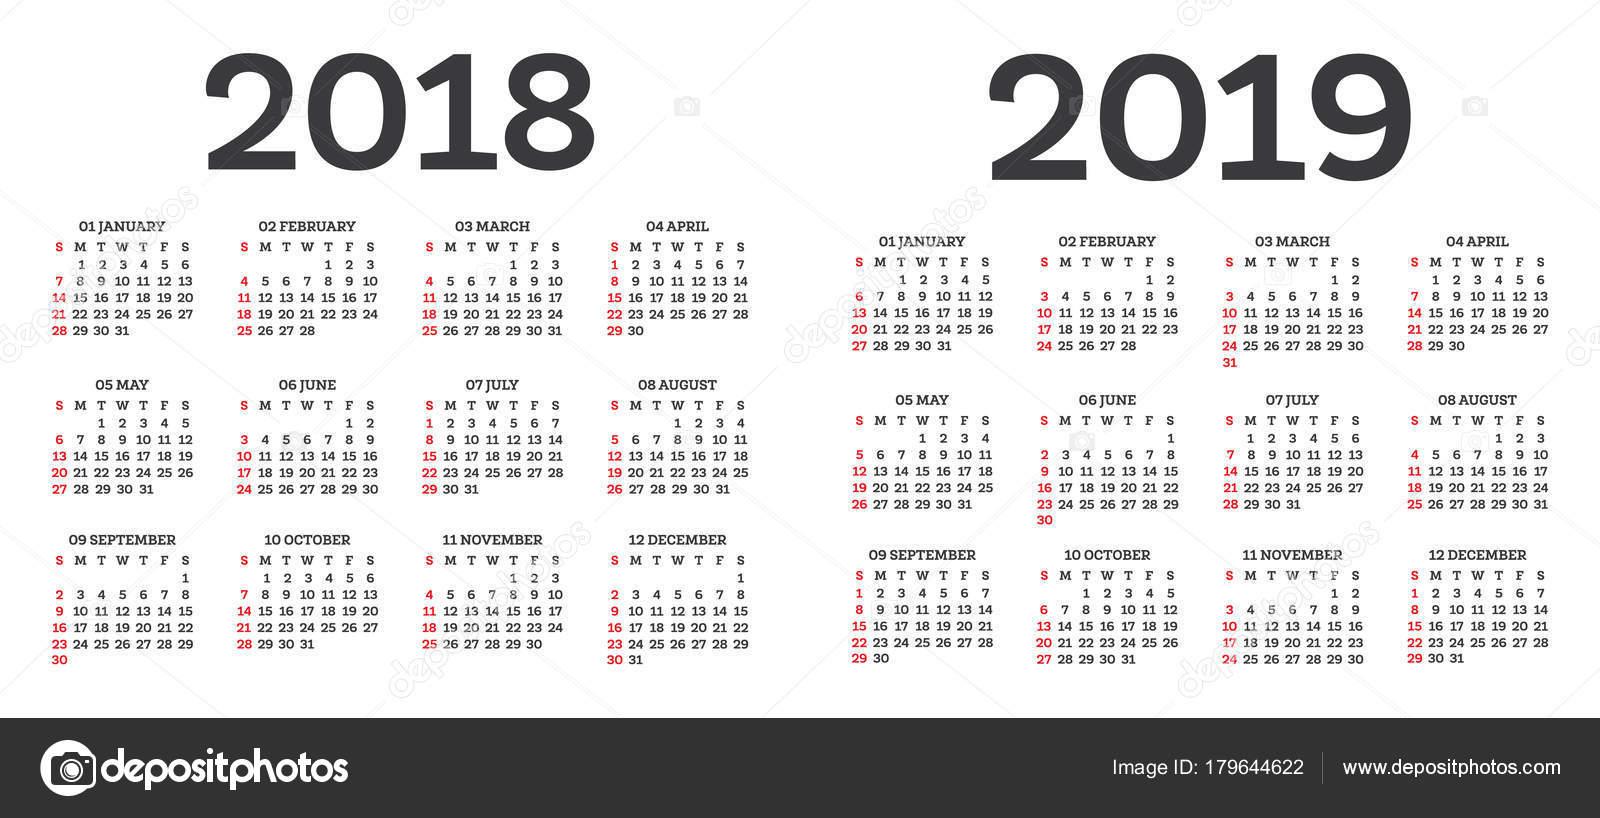 kalender 2018 2019 ge soleerd op witte achtergrond stockvector booblgum 179644622. Black Bedroom Furniture Sets. Home Design Ideas